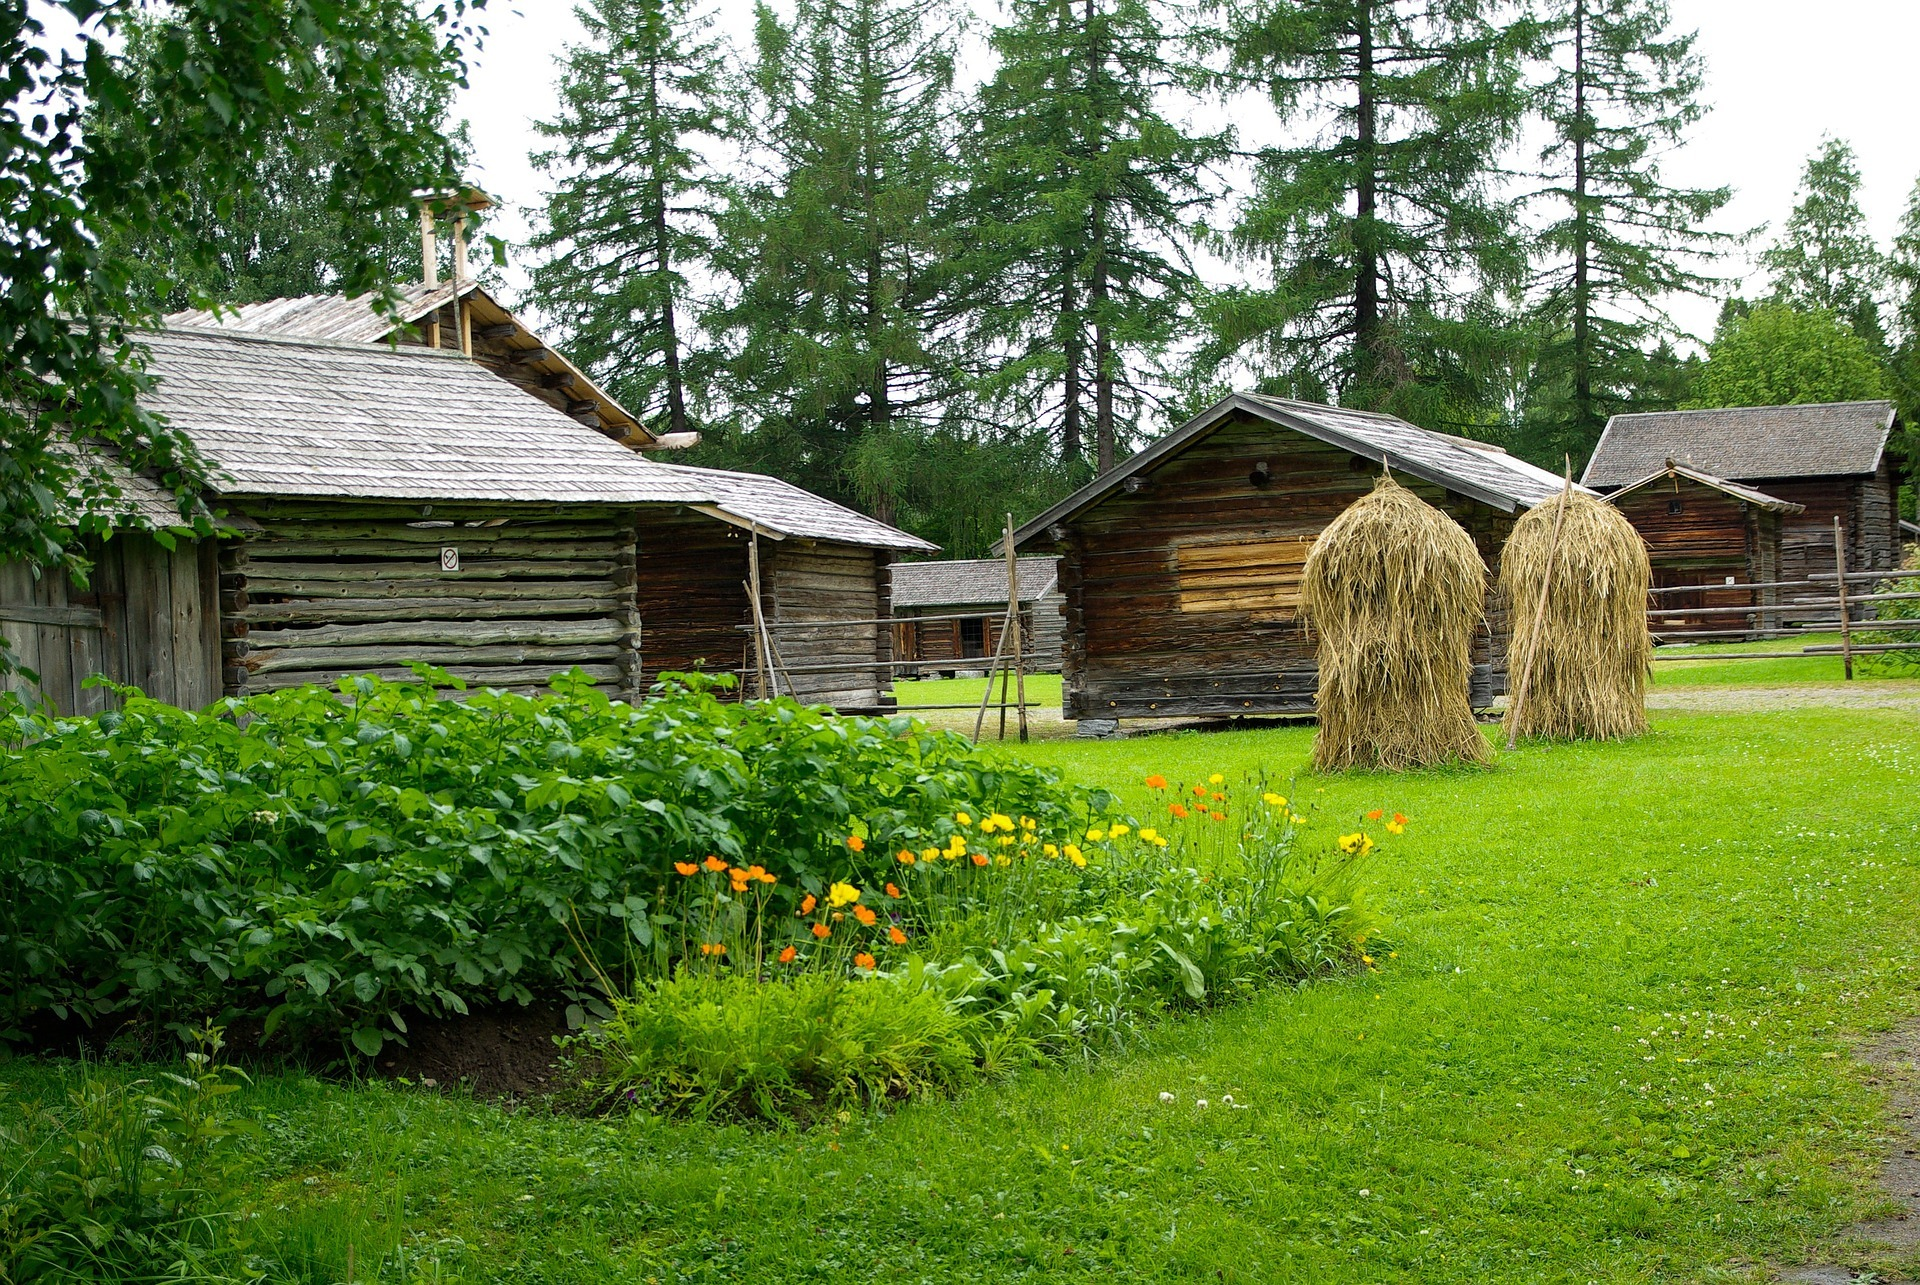 finland-909742_1920